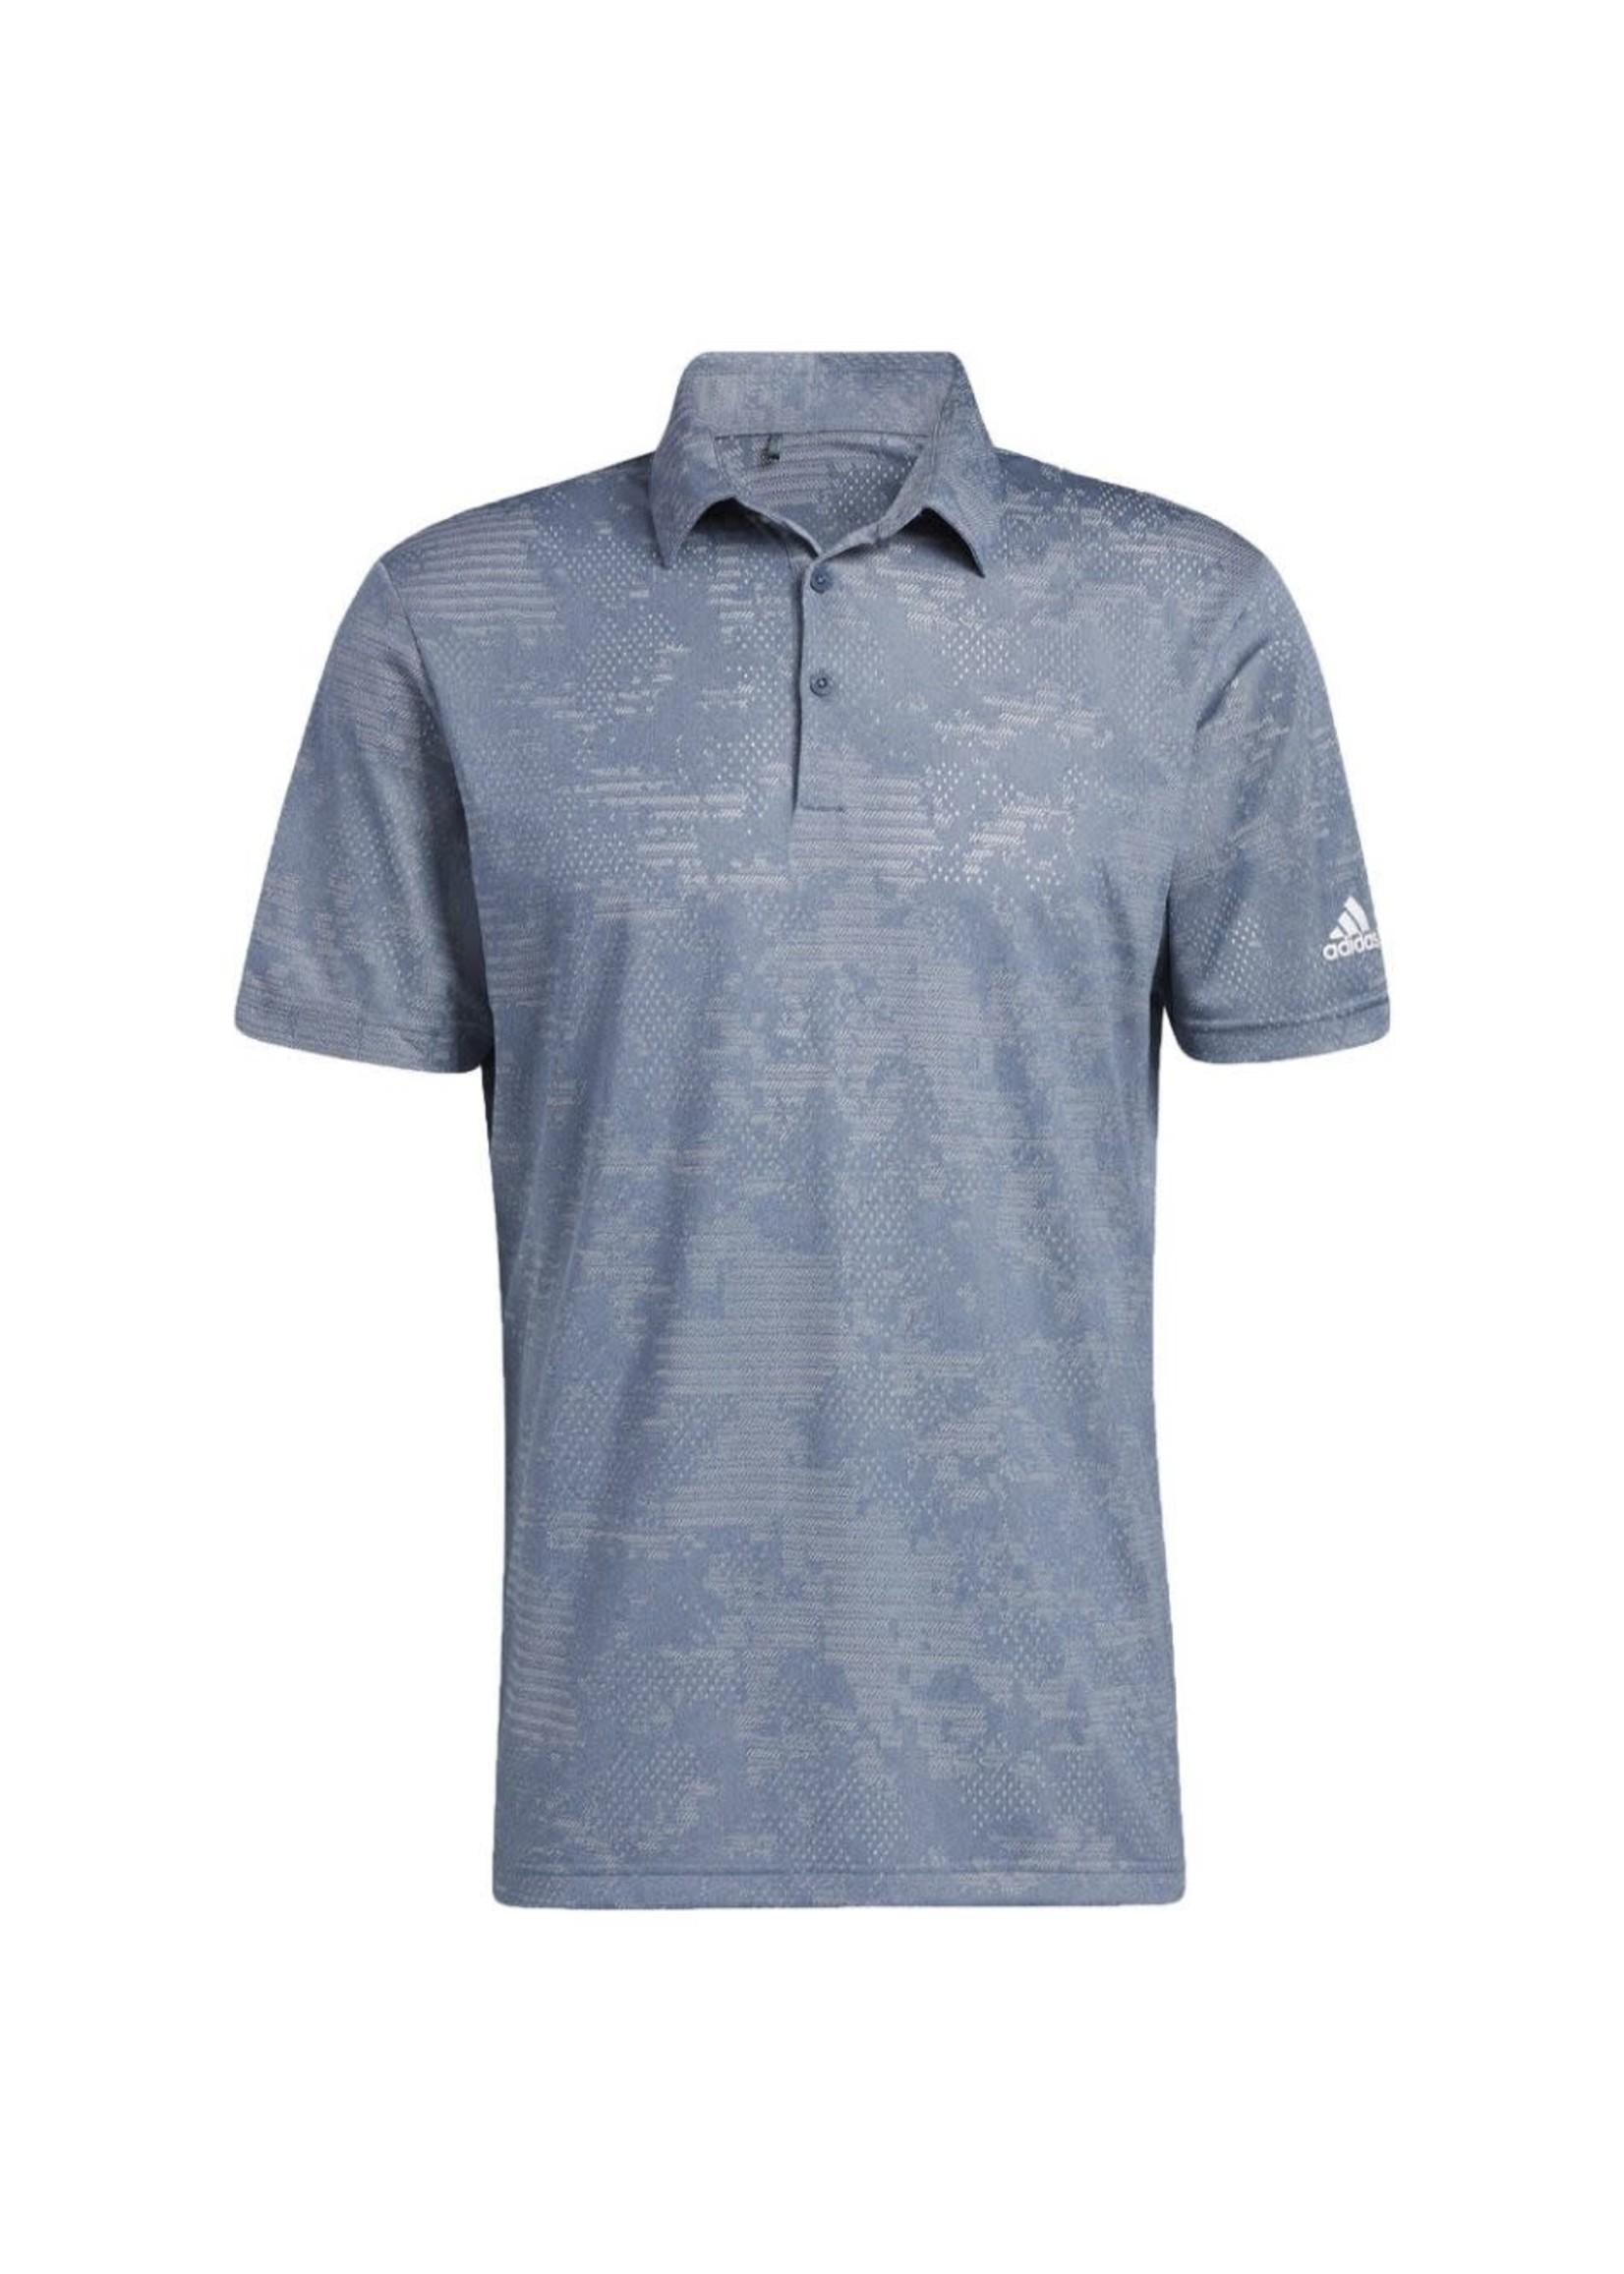 Adidas Adidas Camo Mens Polo Shirt, Grey, (2021)